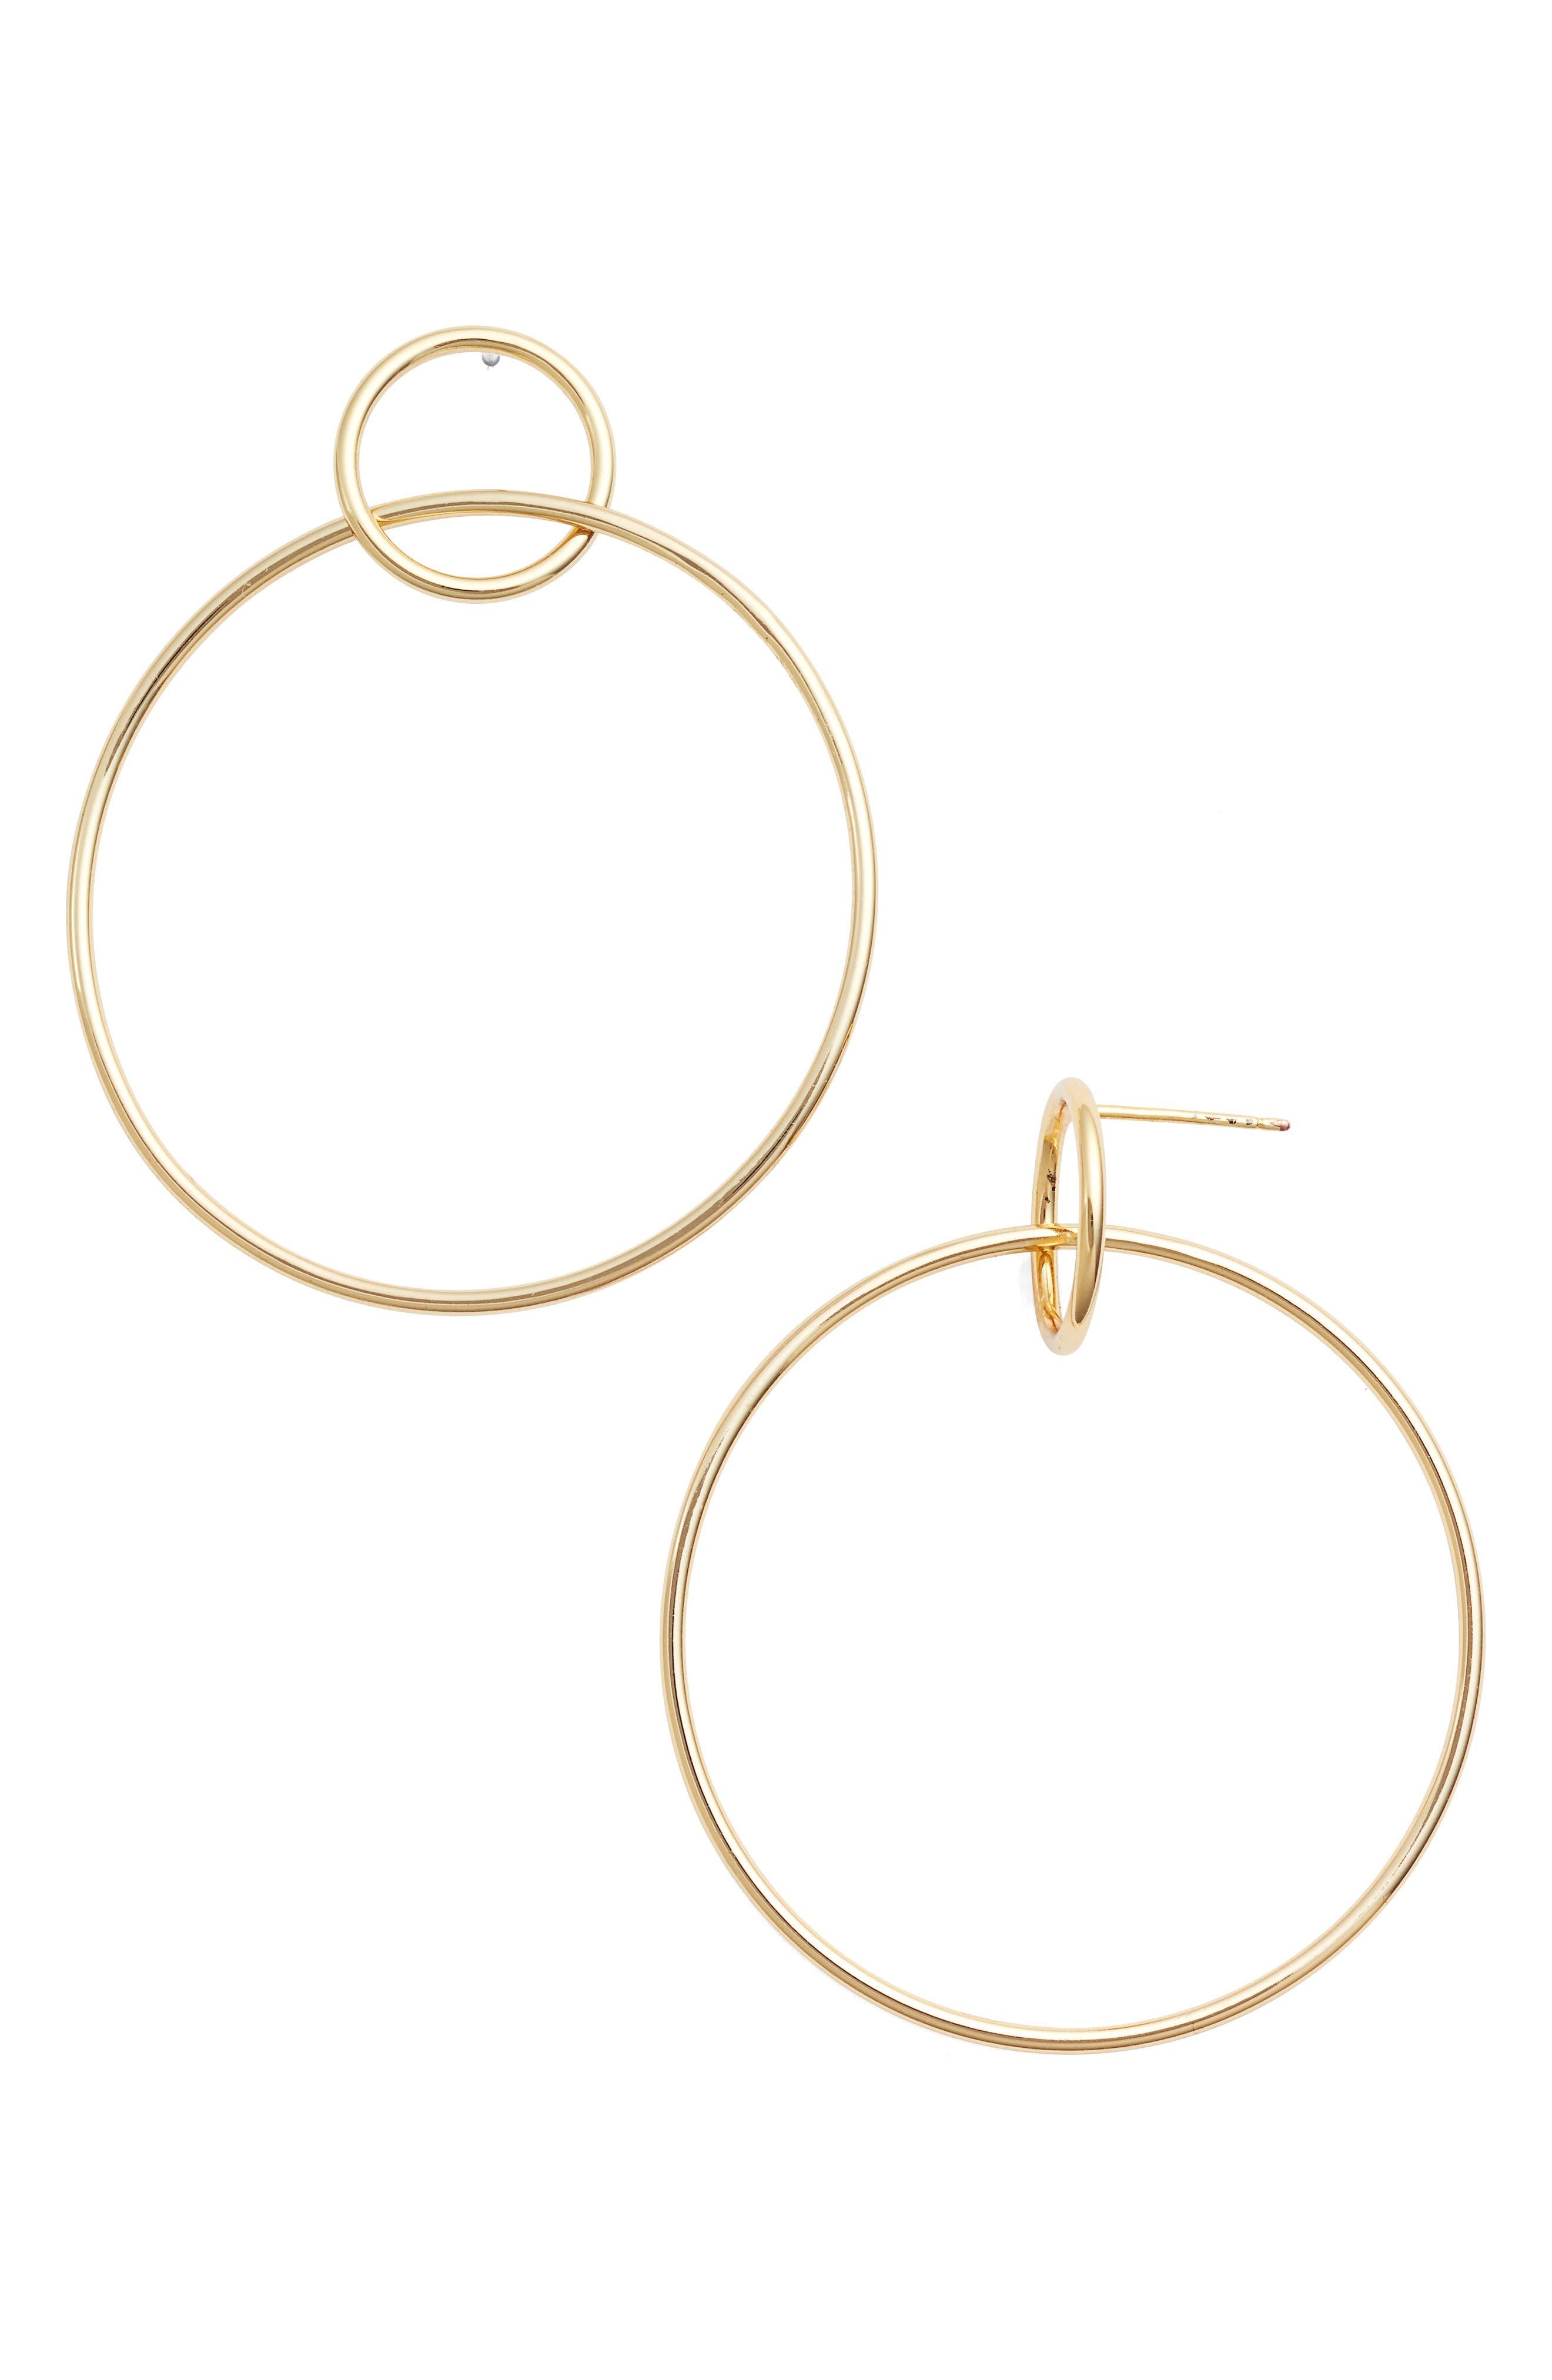 Main Image - Jules Smith Circle Hoop Earrings